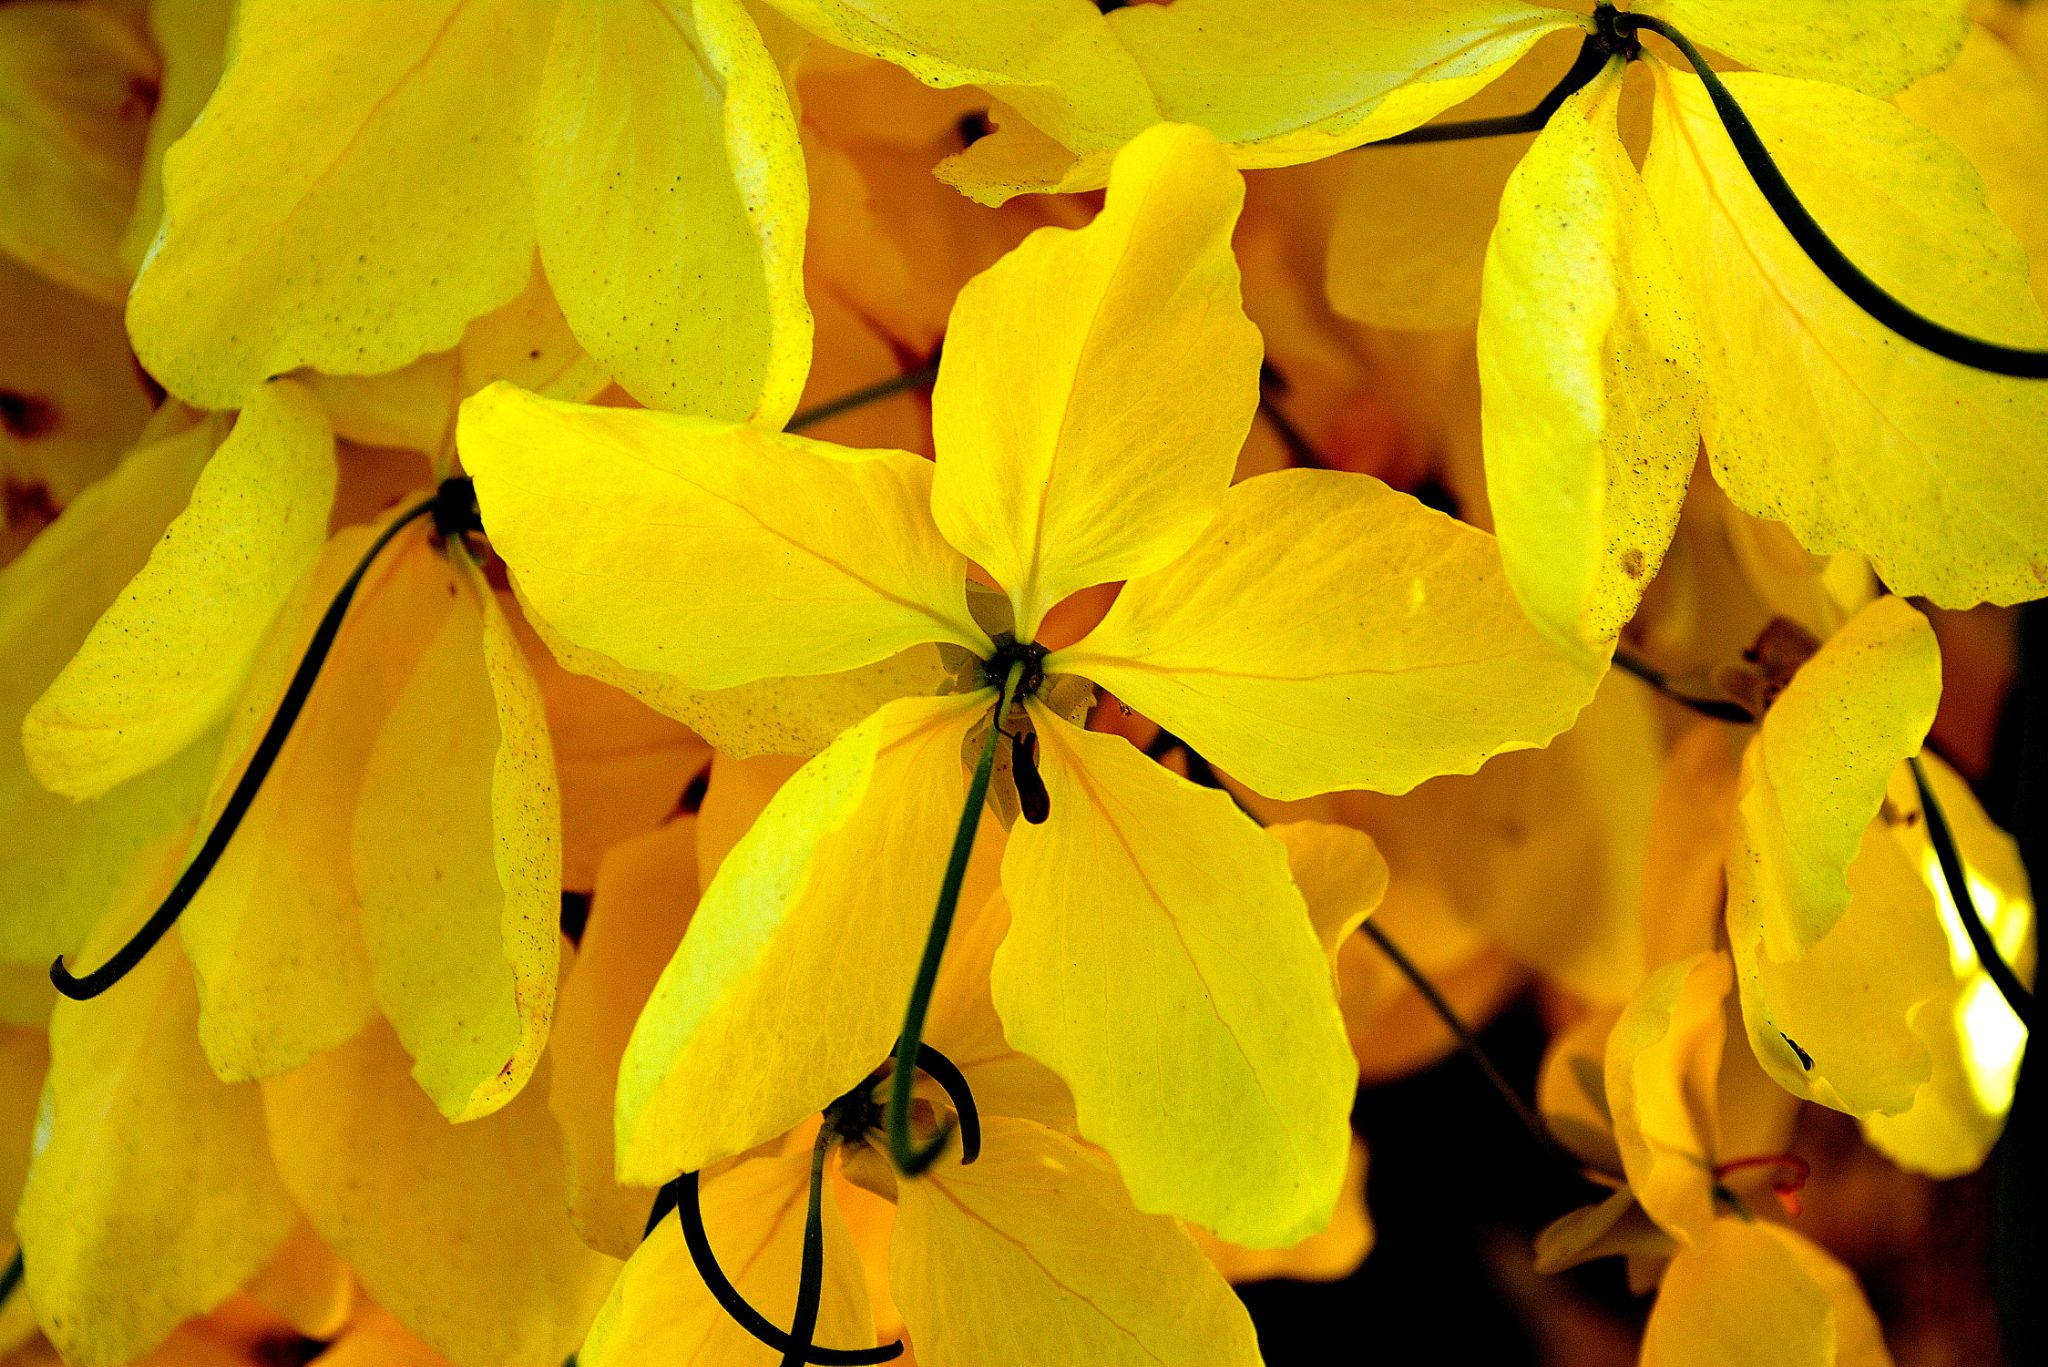 This stunning yellow by אשר שמולביץ